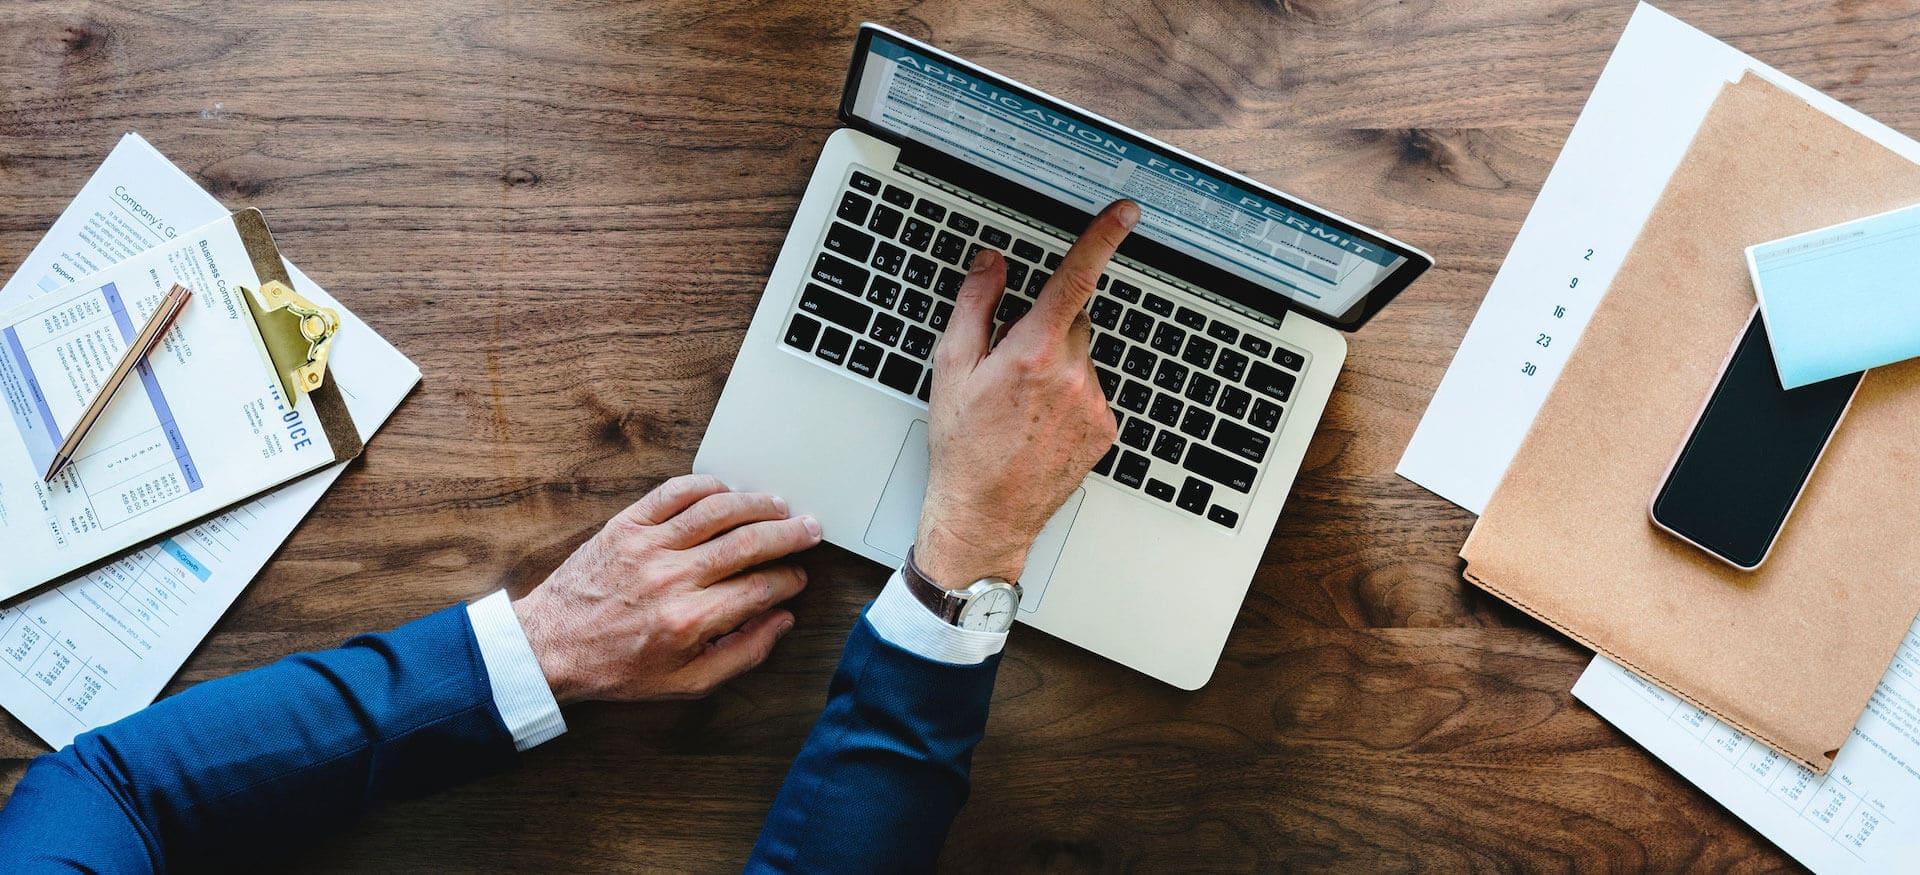 Externes Rechnungswesen Online-Kurs